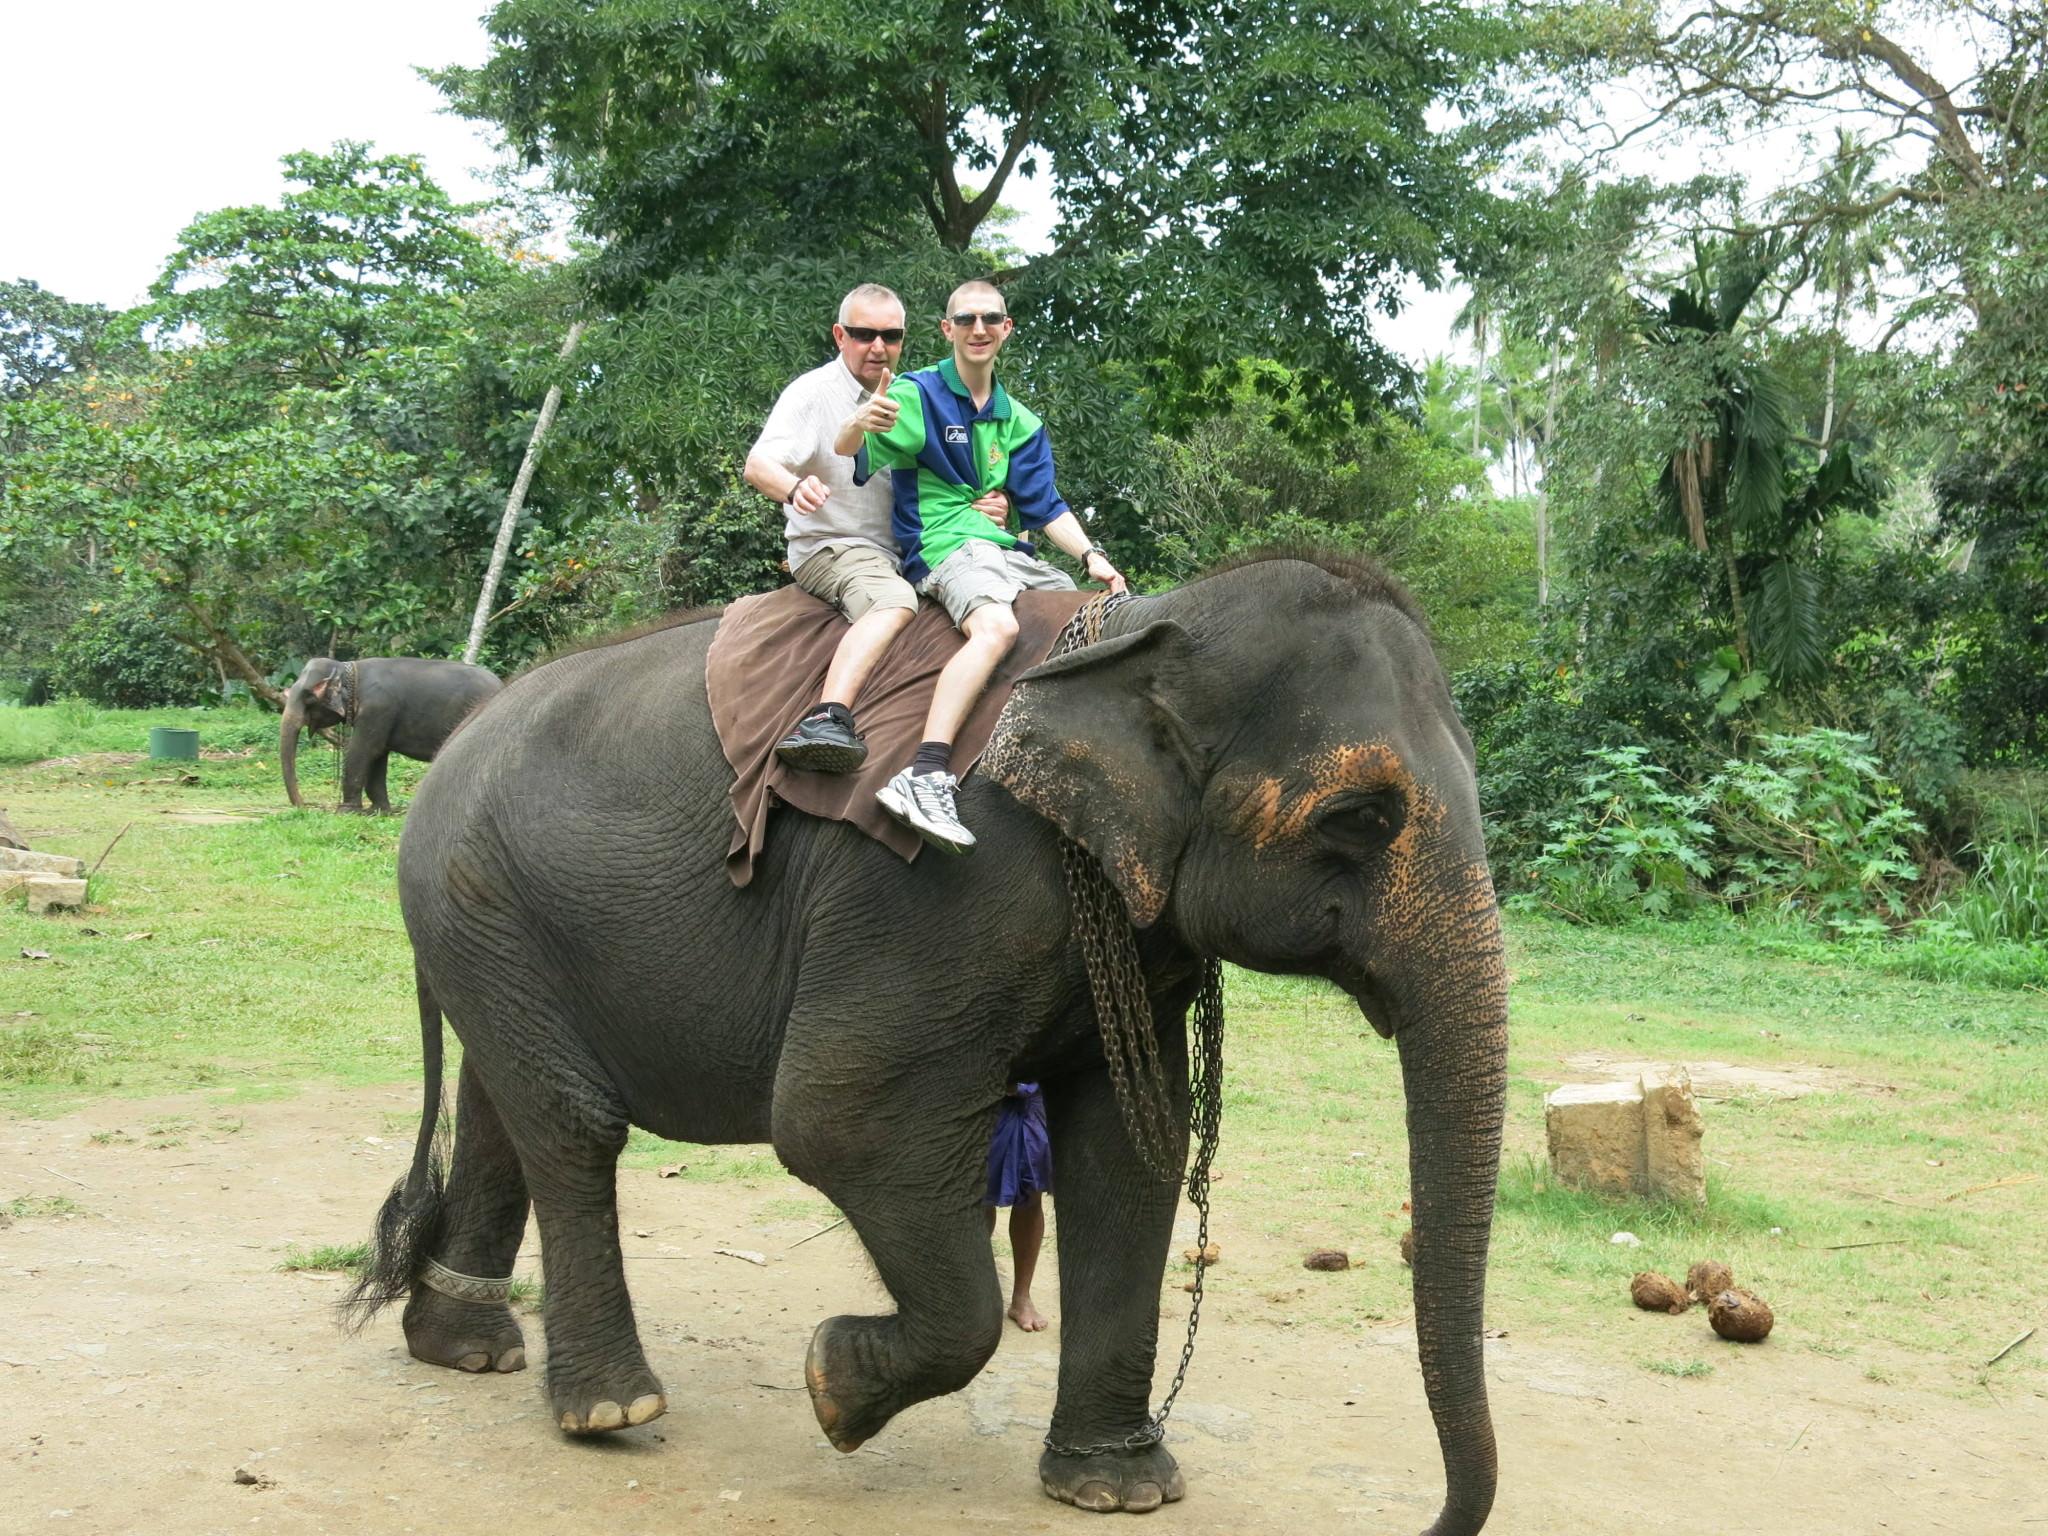 Jonny Blair elephant riding in Pinnawala in Sri Lanka